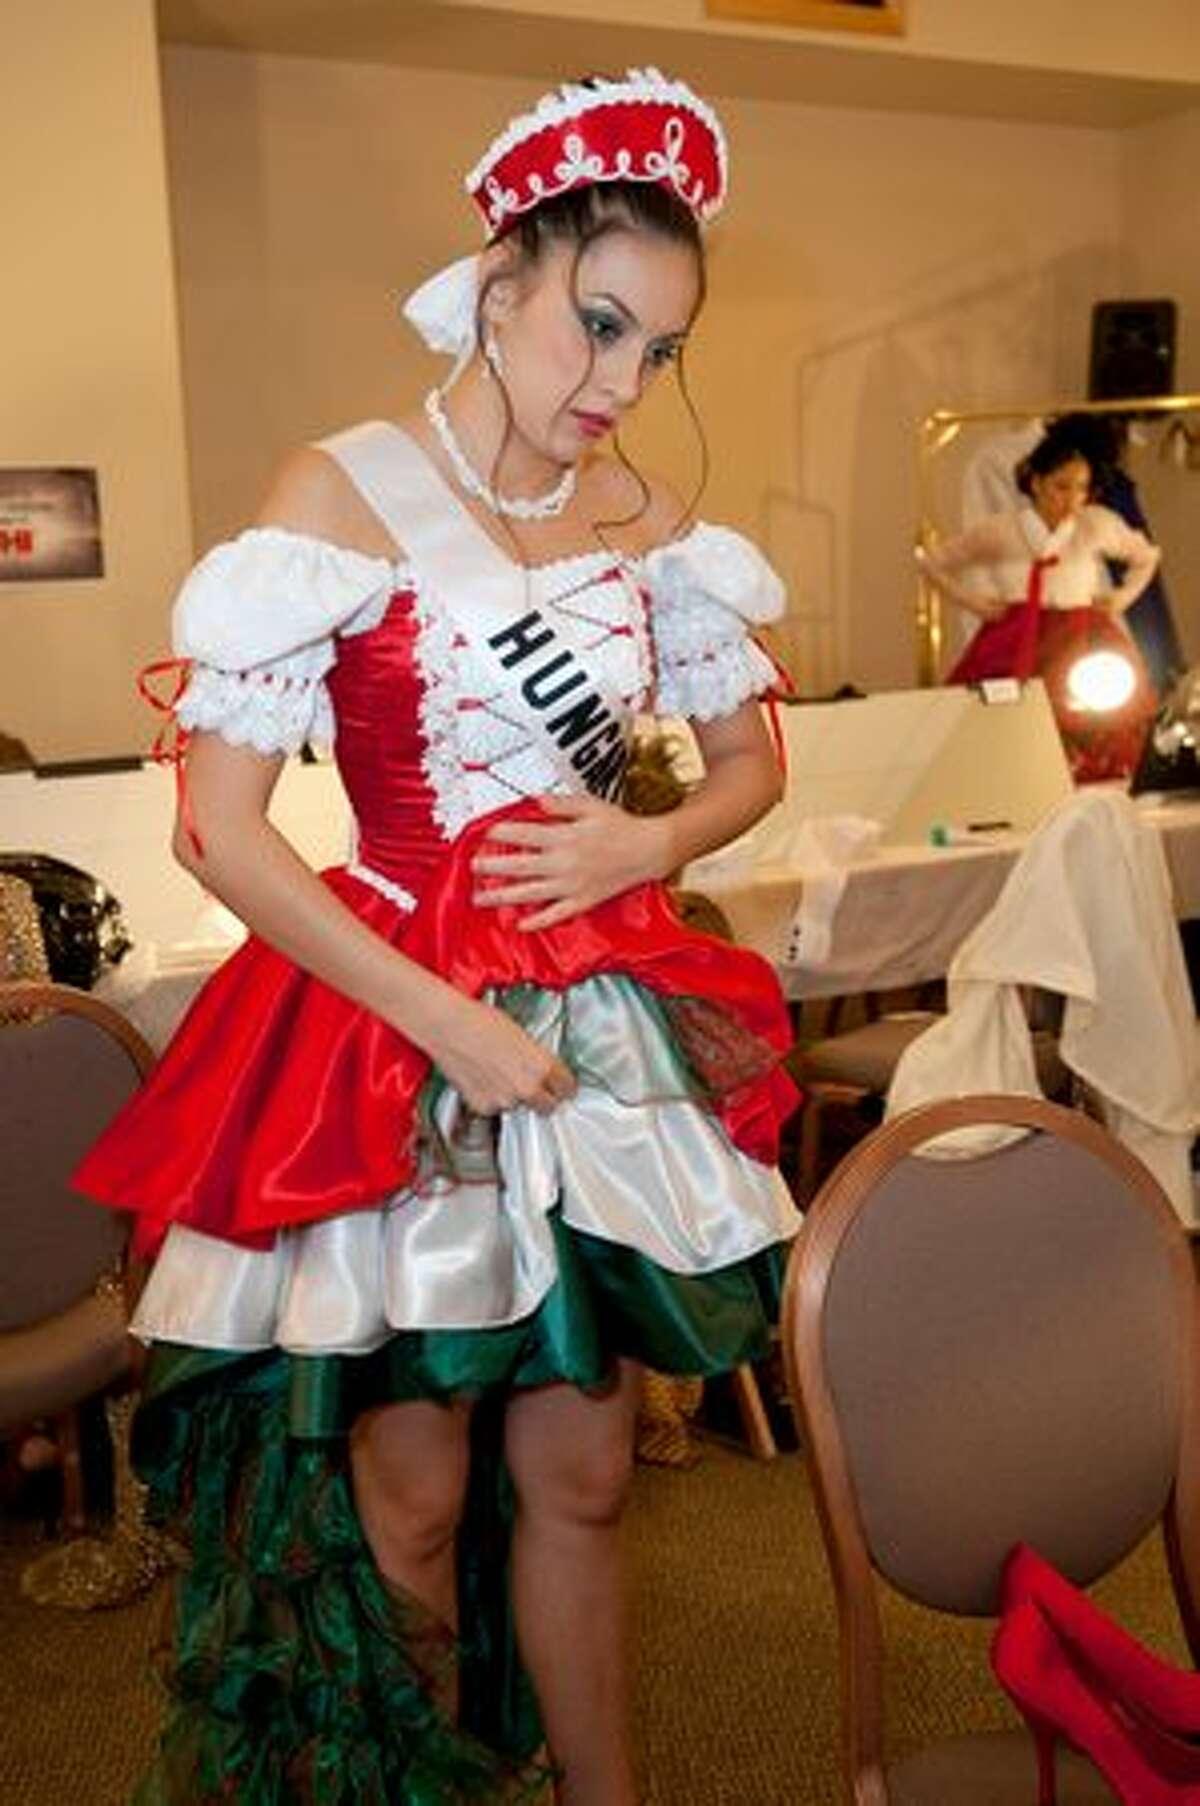 Timea Babinyecz, Miss Hungary 2010, prepares herself backstage.